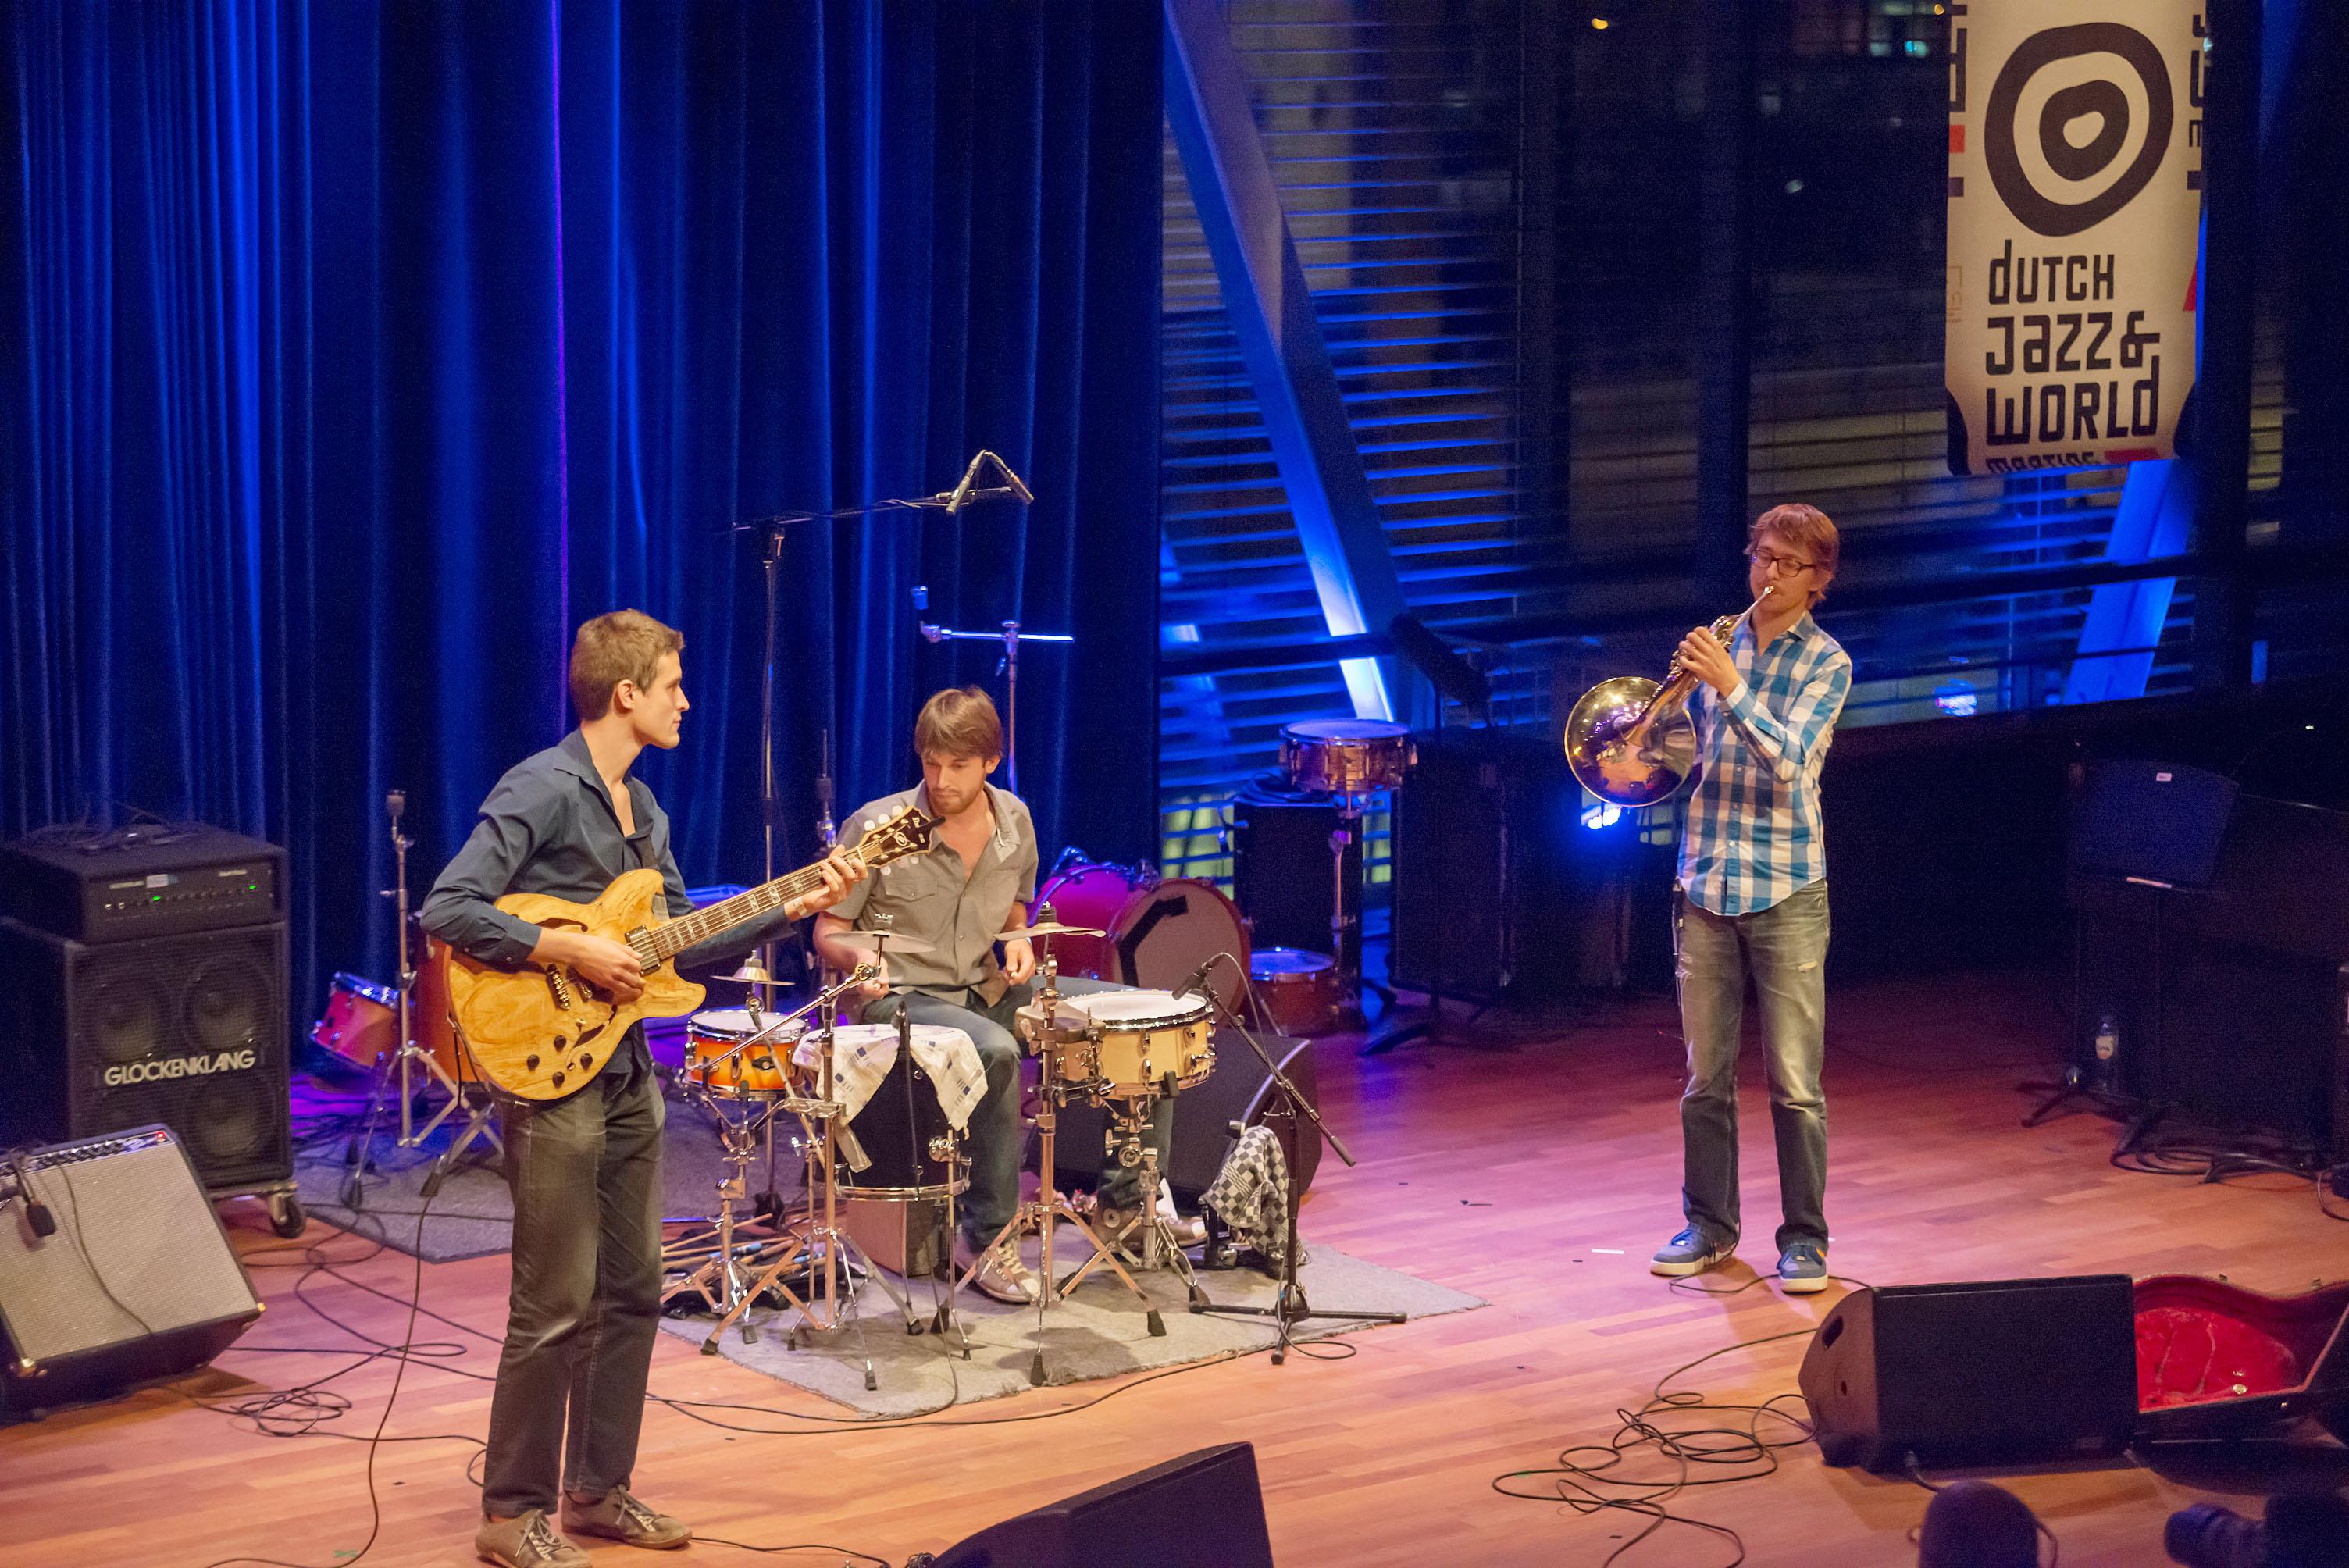 Kapok at Dutch Jazz & World Meeting 2012